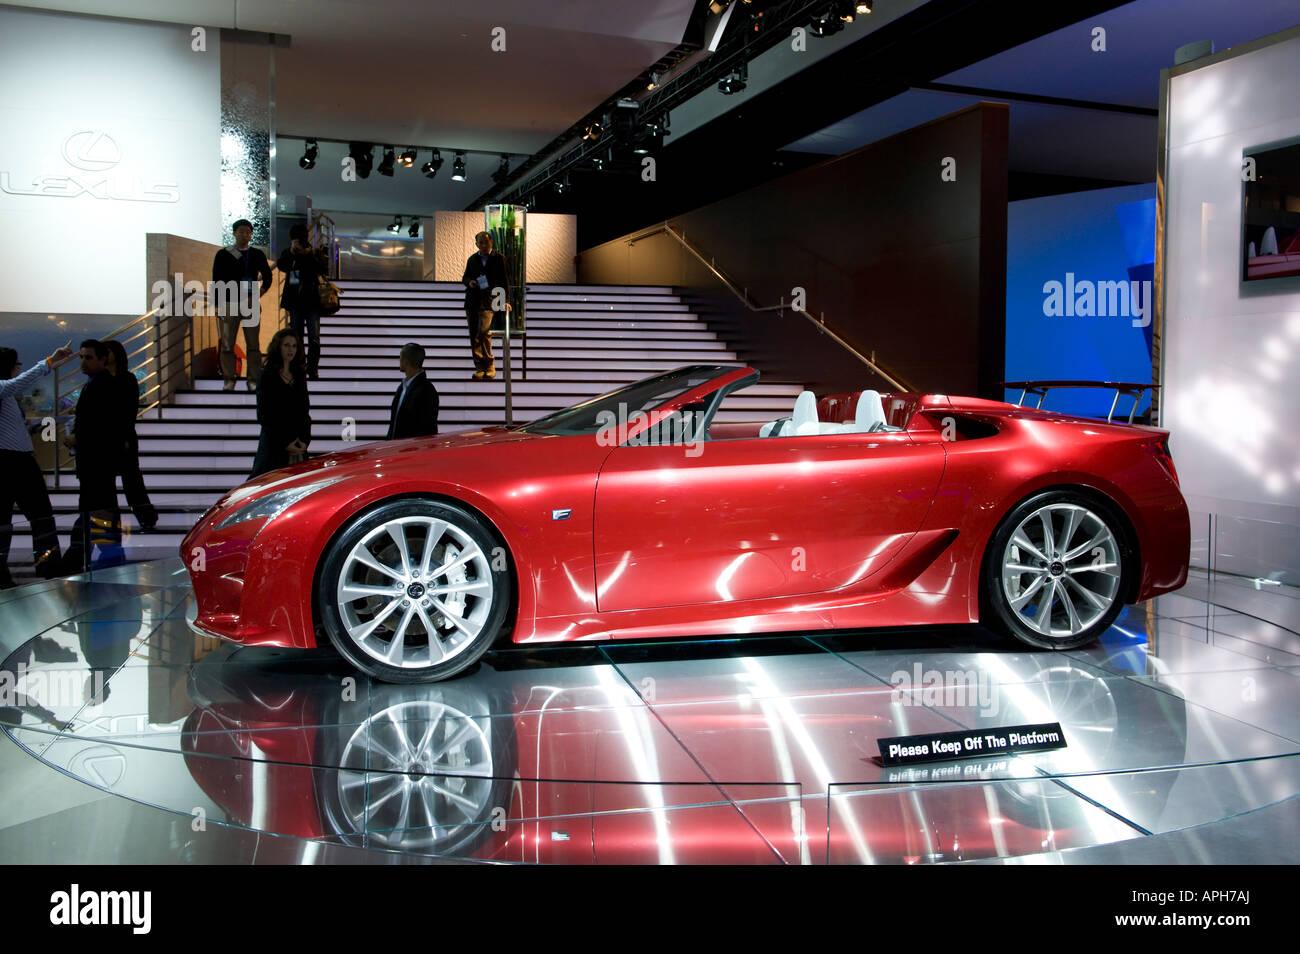 http://c8.alamy.com/comp/APH7AJ/lexus-lf-a-roadster-sports-car-concept-at-the-2008-north-american-APH7AJ.jpg